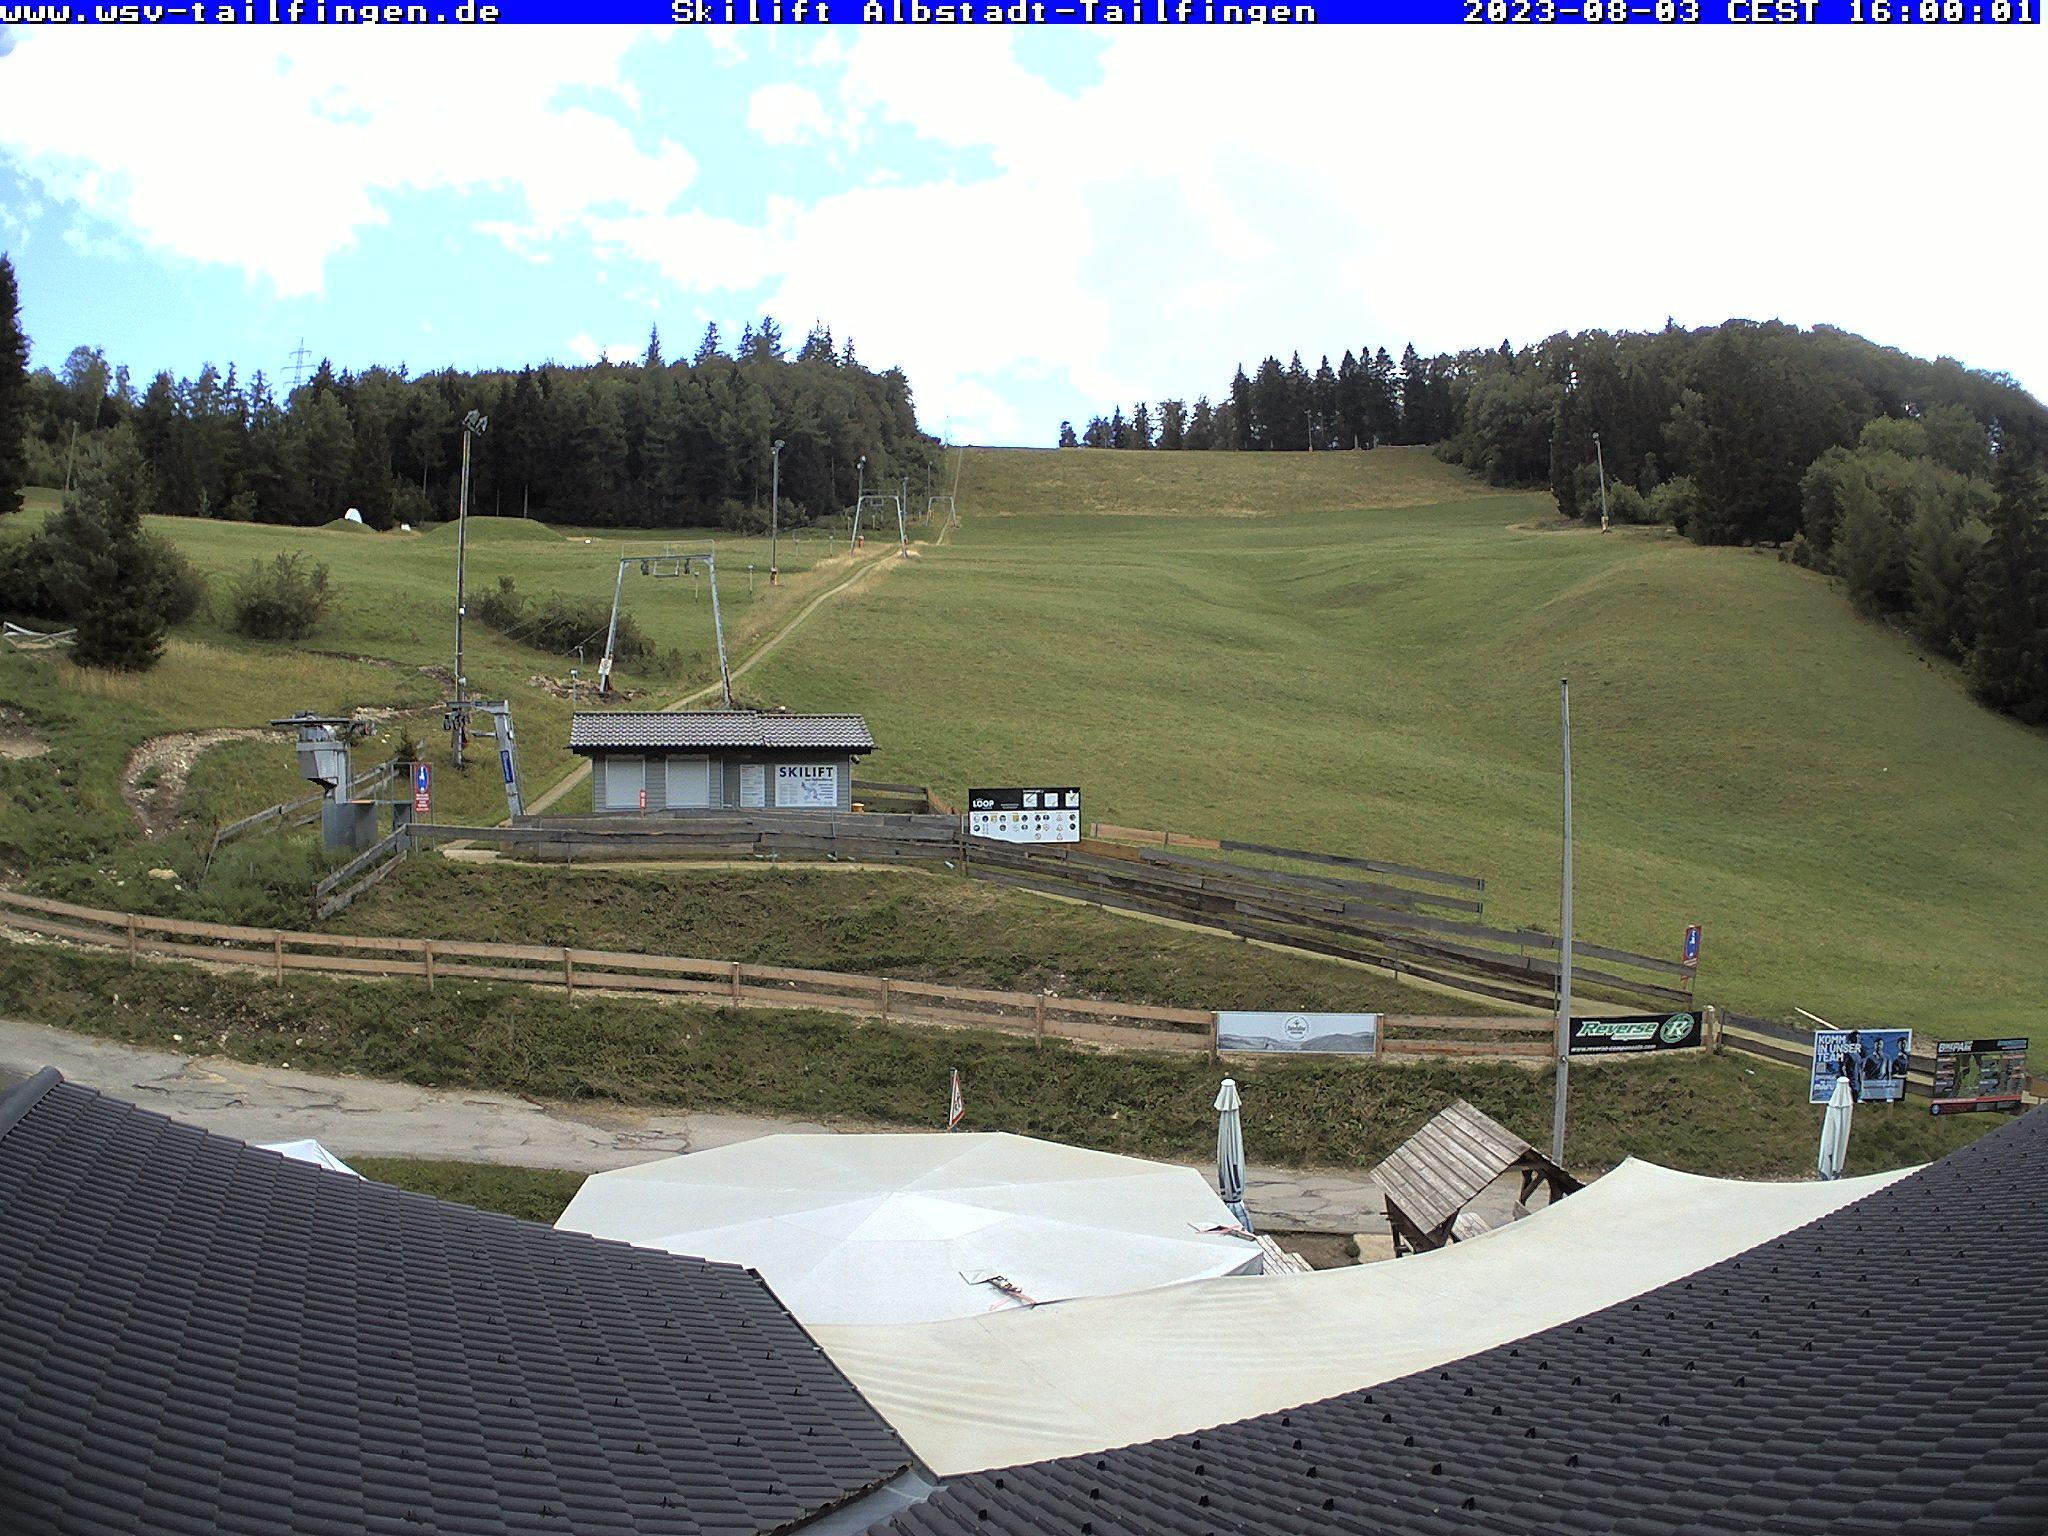 Webcam-Foto 16:00 Uhr / Skilift Albstadt-Tailfingen